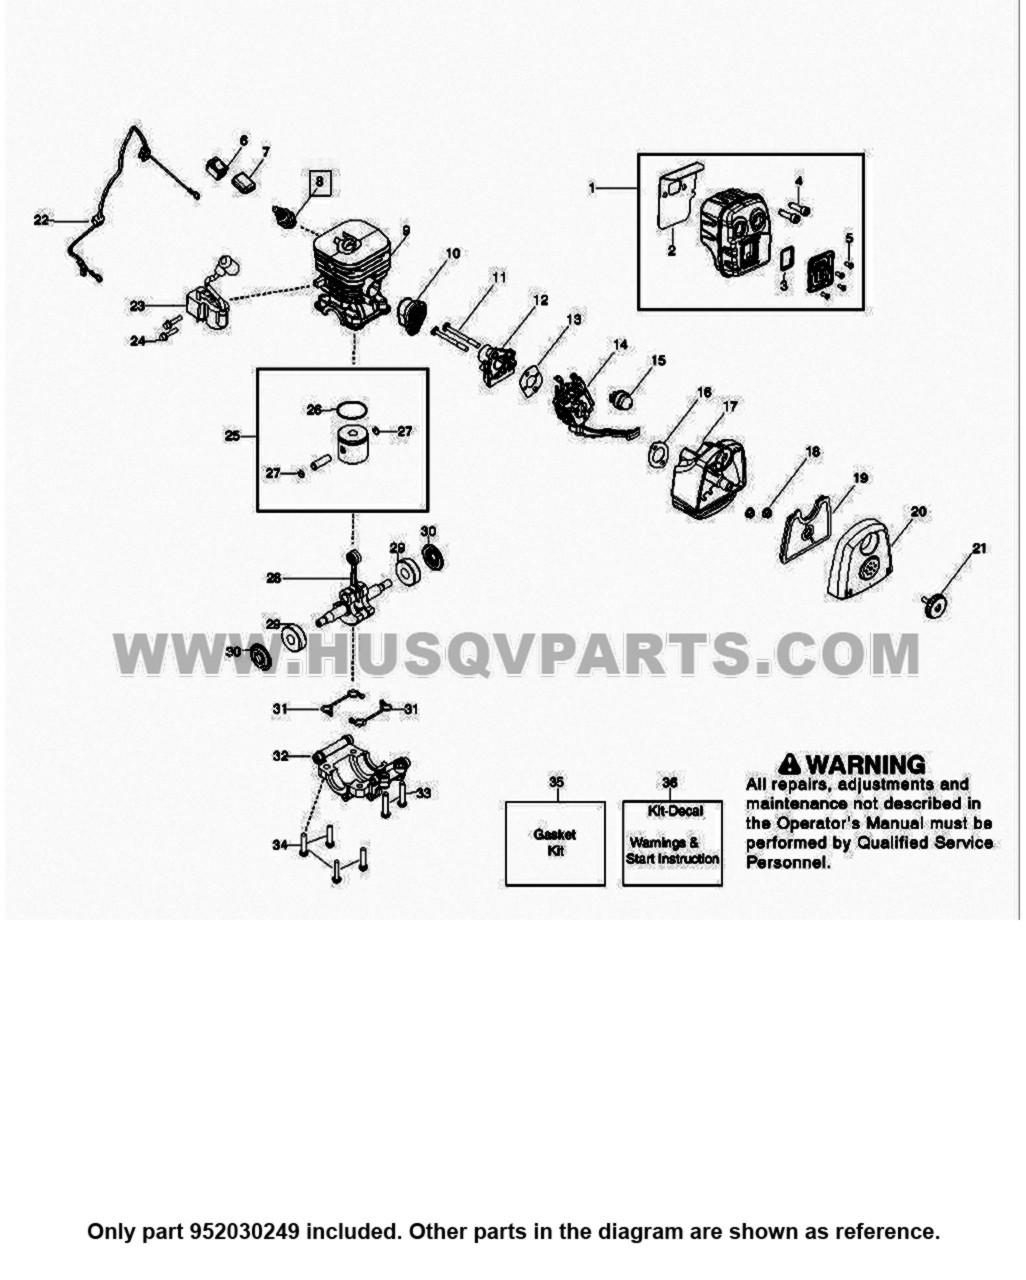 Parts lookup Husqvarna 125B Spark Plug 952030249 diagram